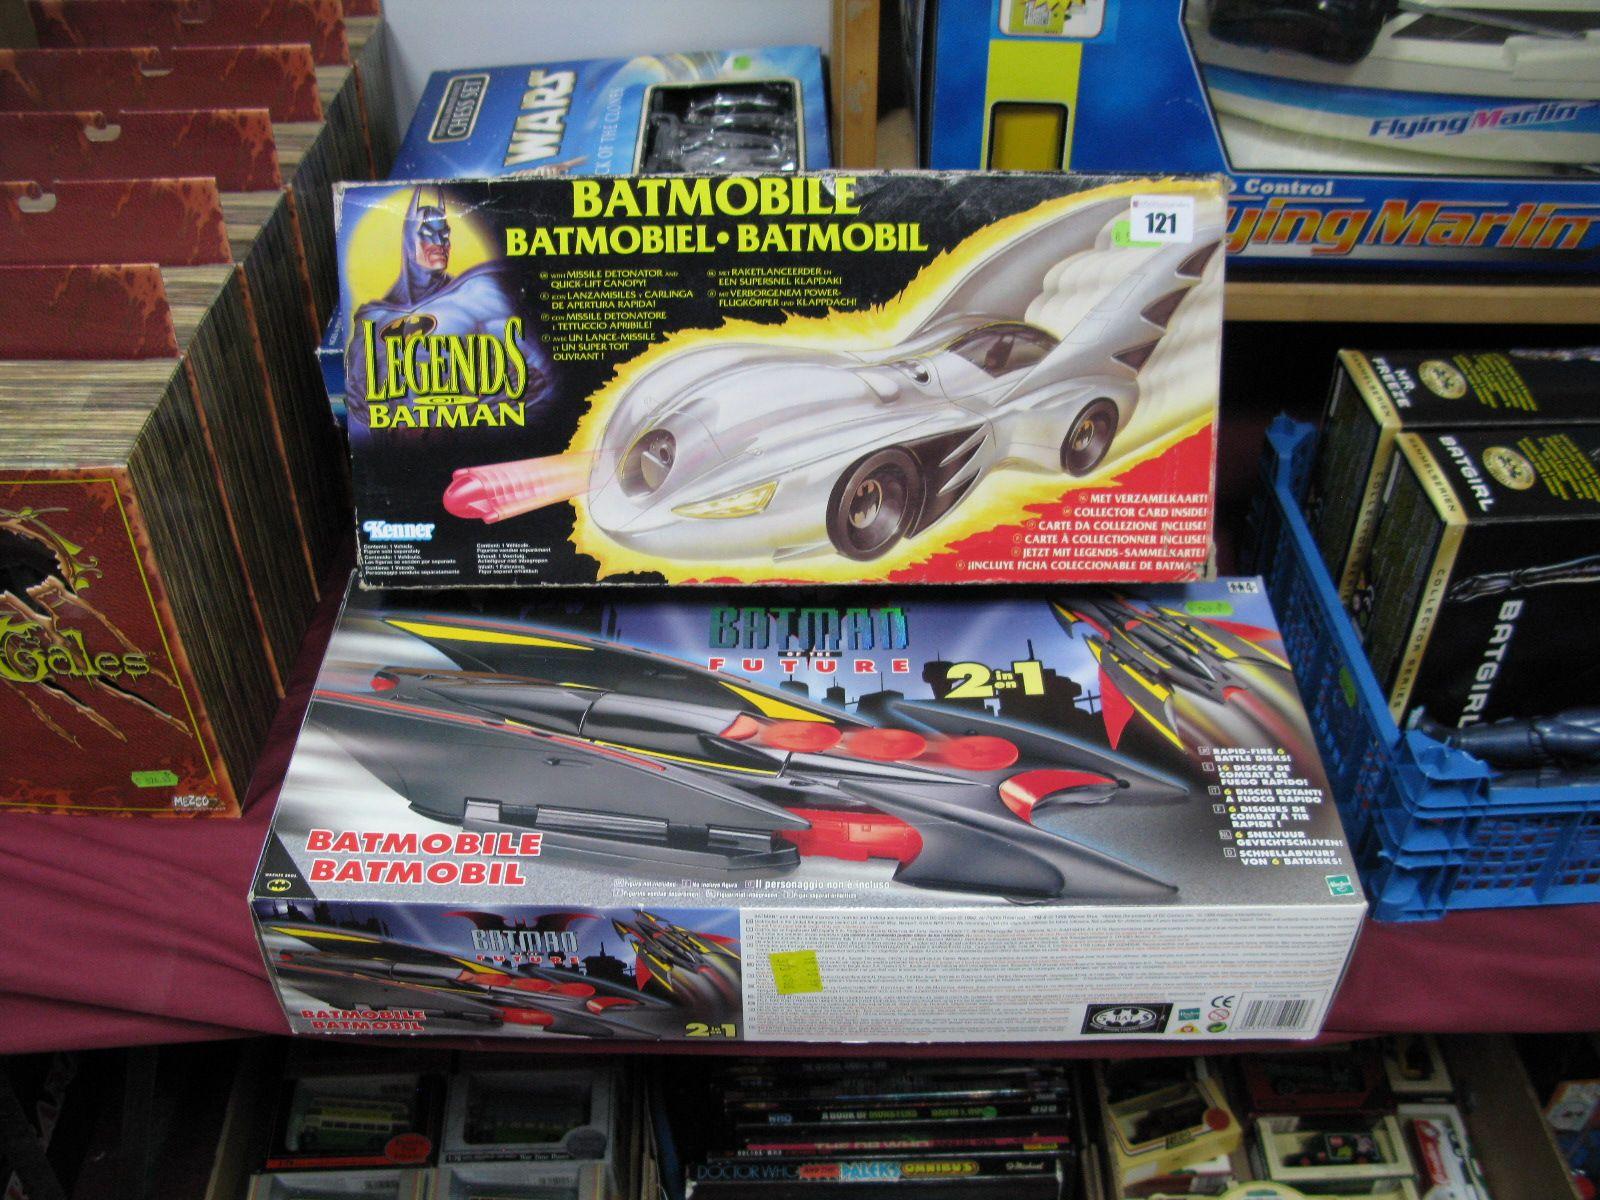 Two Boxed Batman Vehicles Legends of Batman Batmobile by Kenner